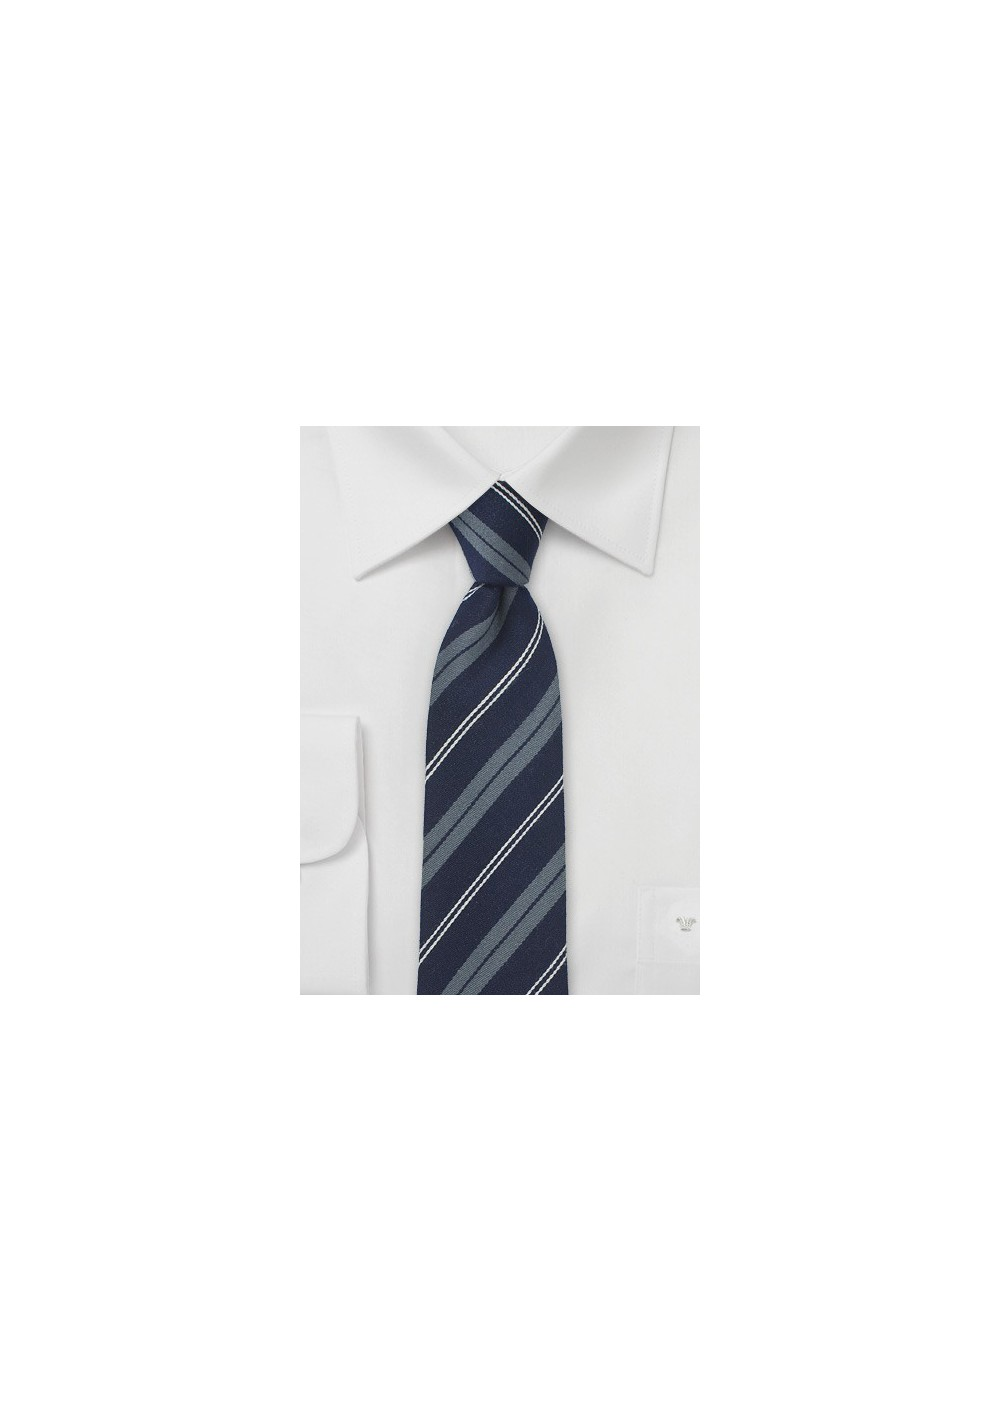 Designer Wool Tie in Navy and Stripes